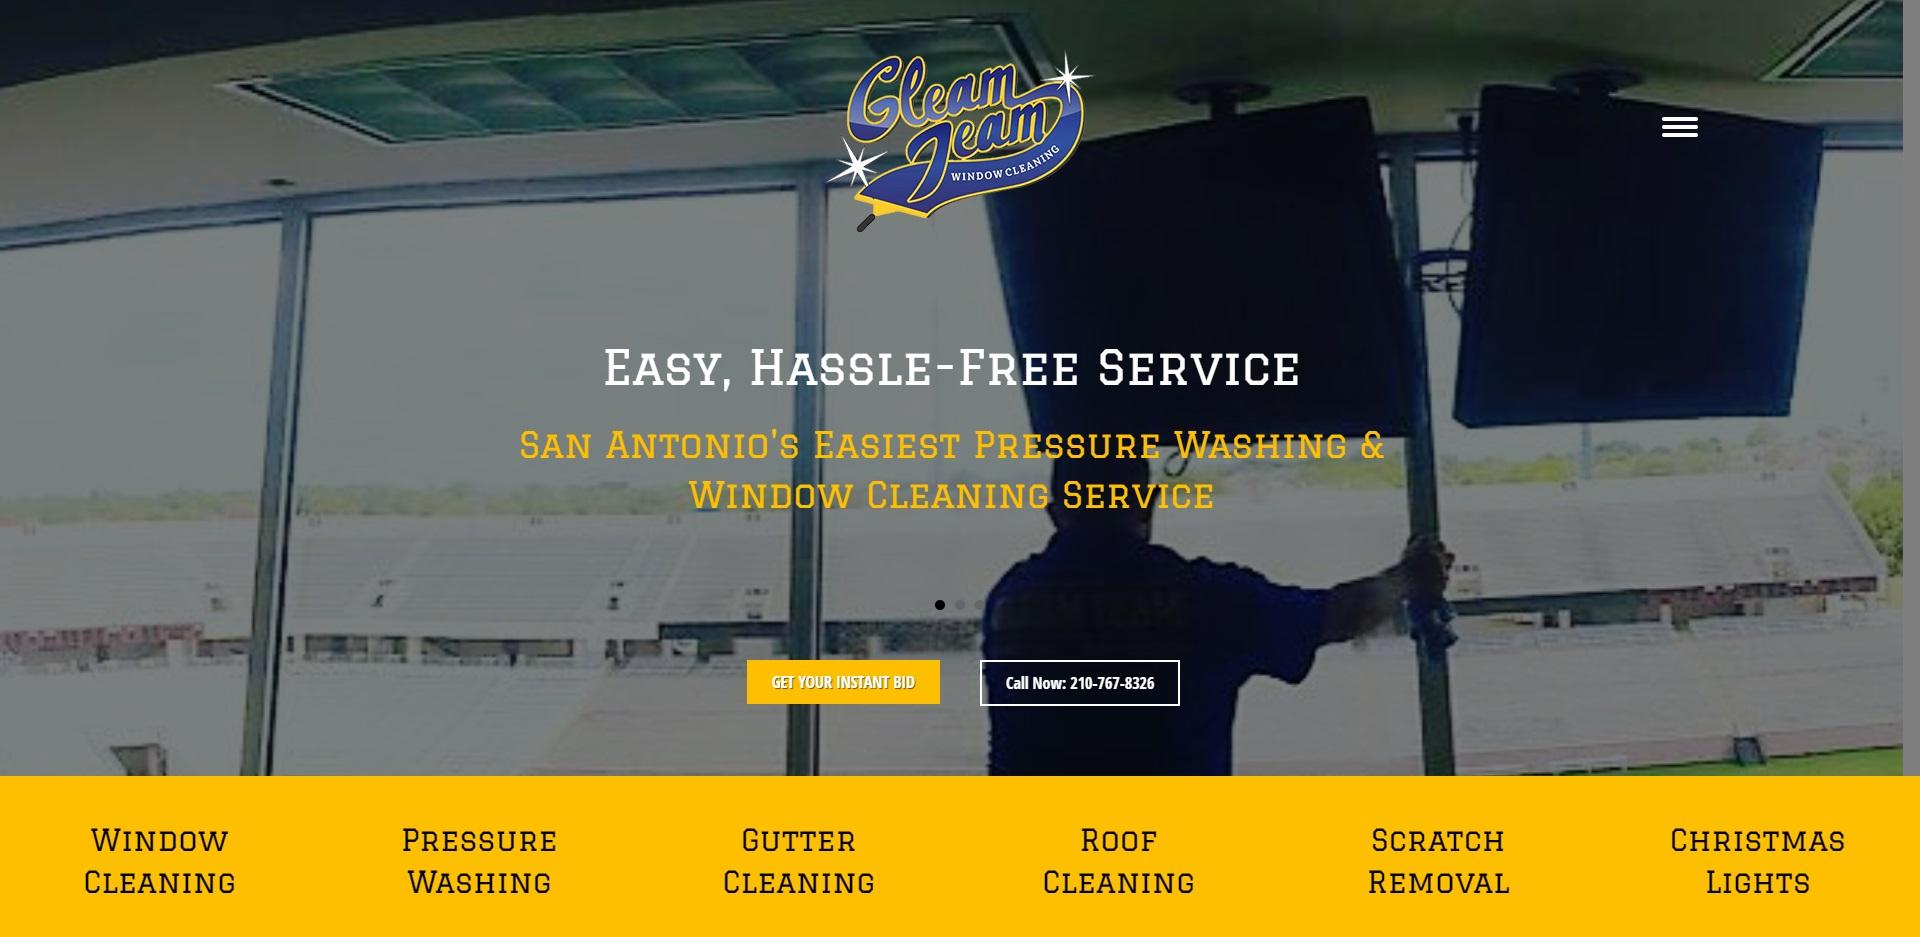 The Best Window Companies in San Antonio